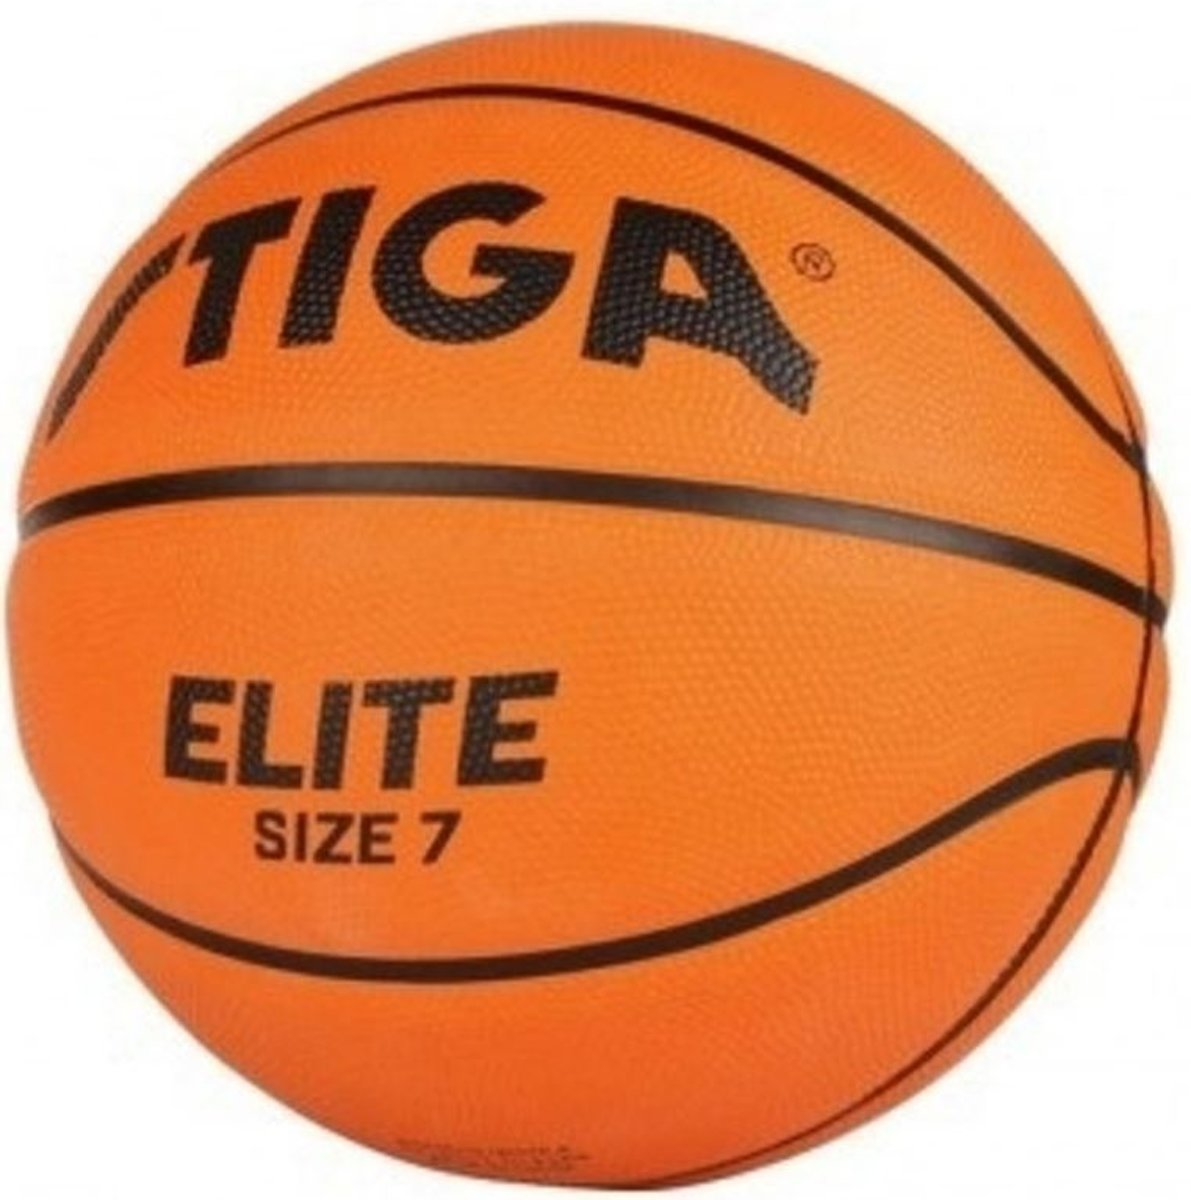 Stiga Basketbal Elite Oranje Maat 7 kopen